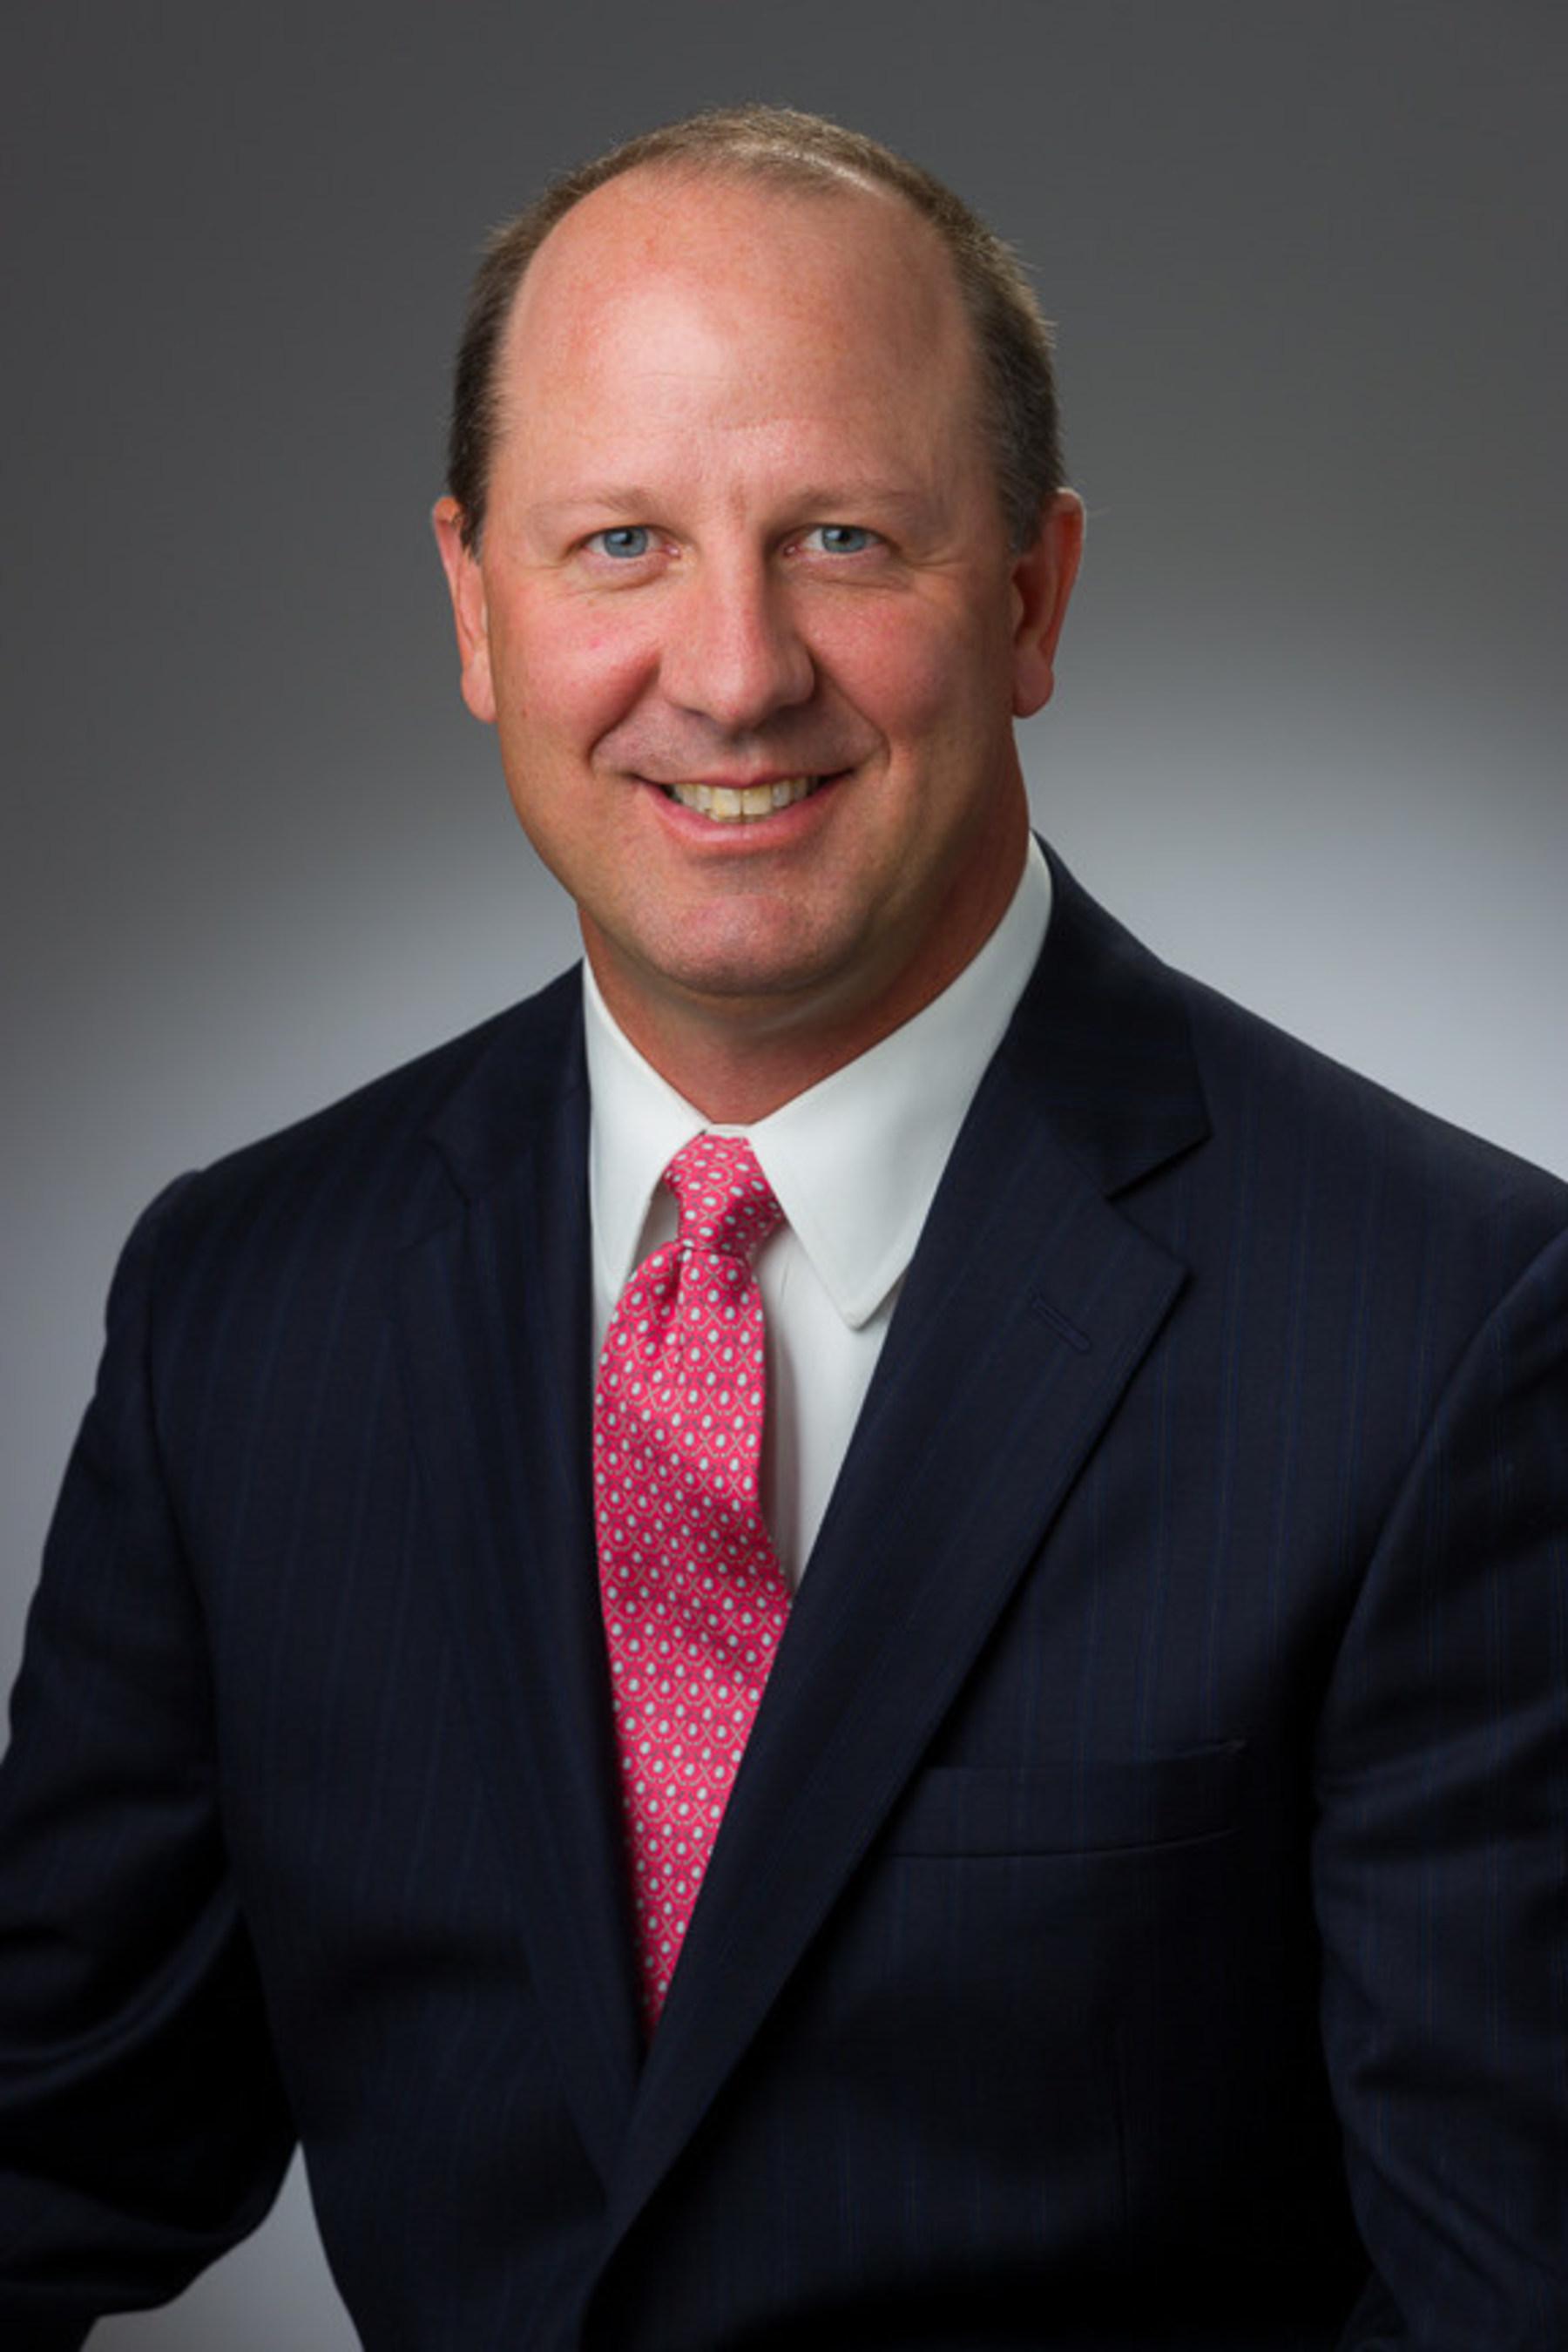 Impax Names Douglas S. Boothe President of Generics Division